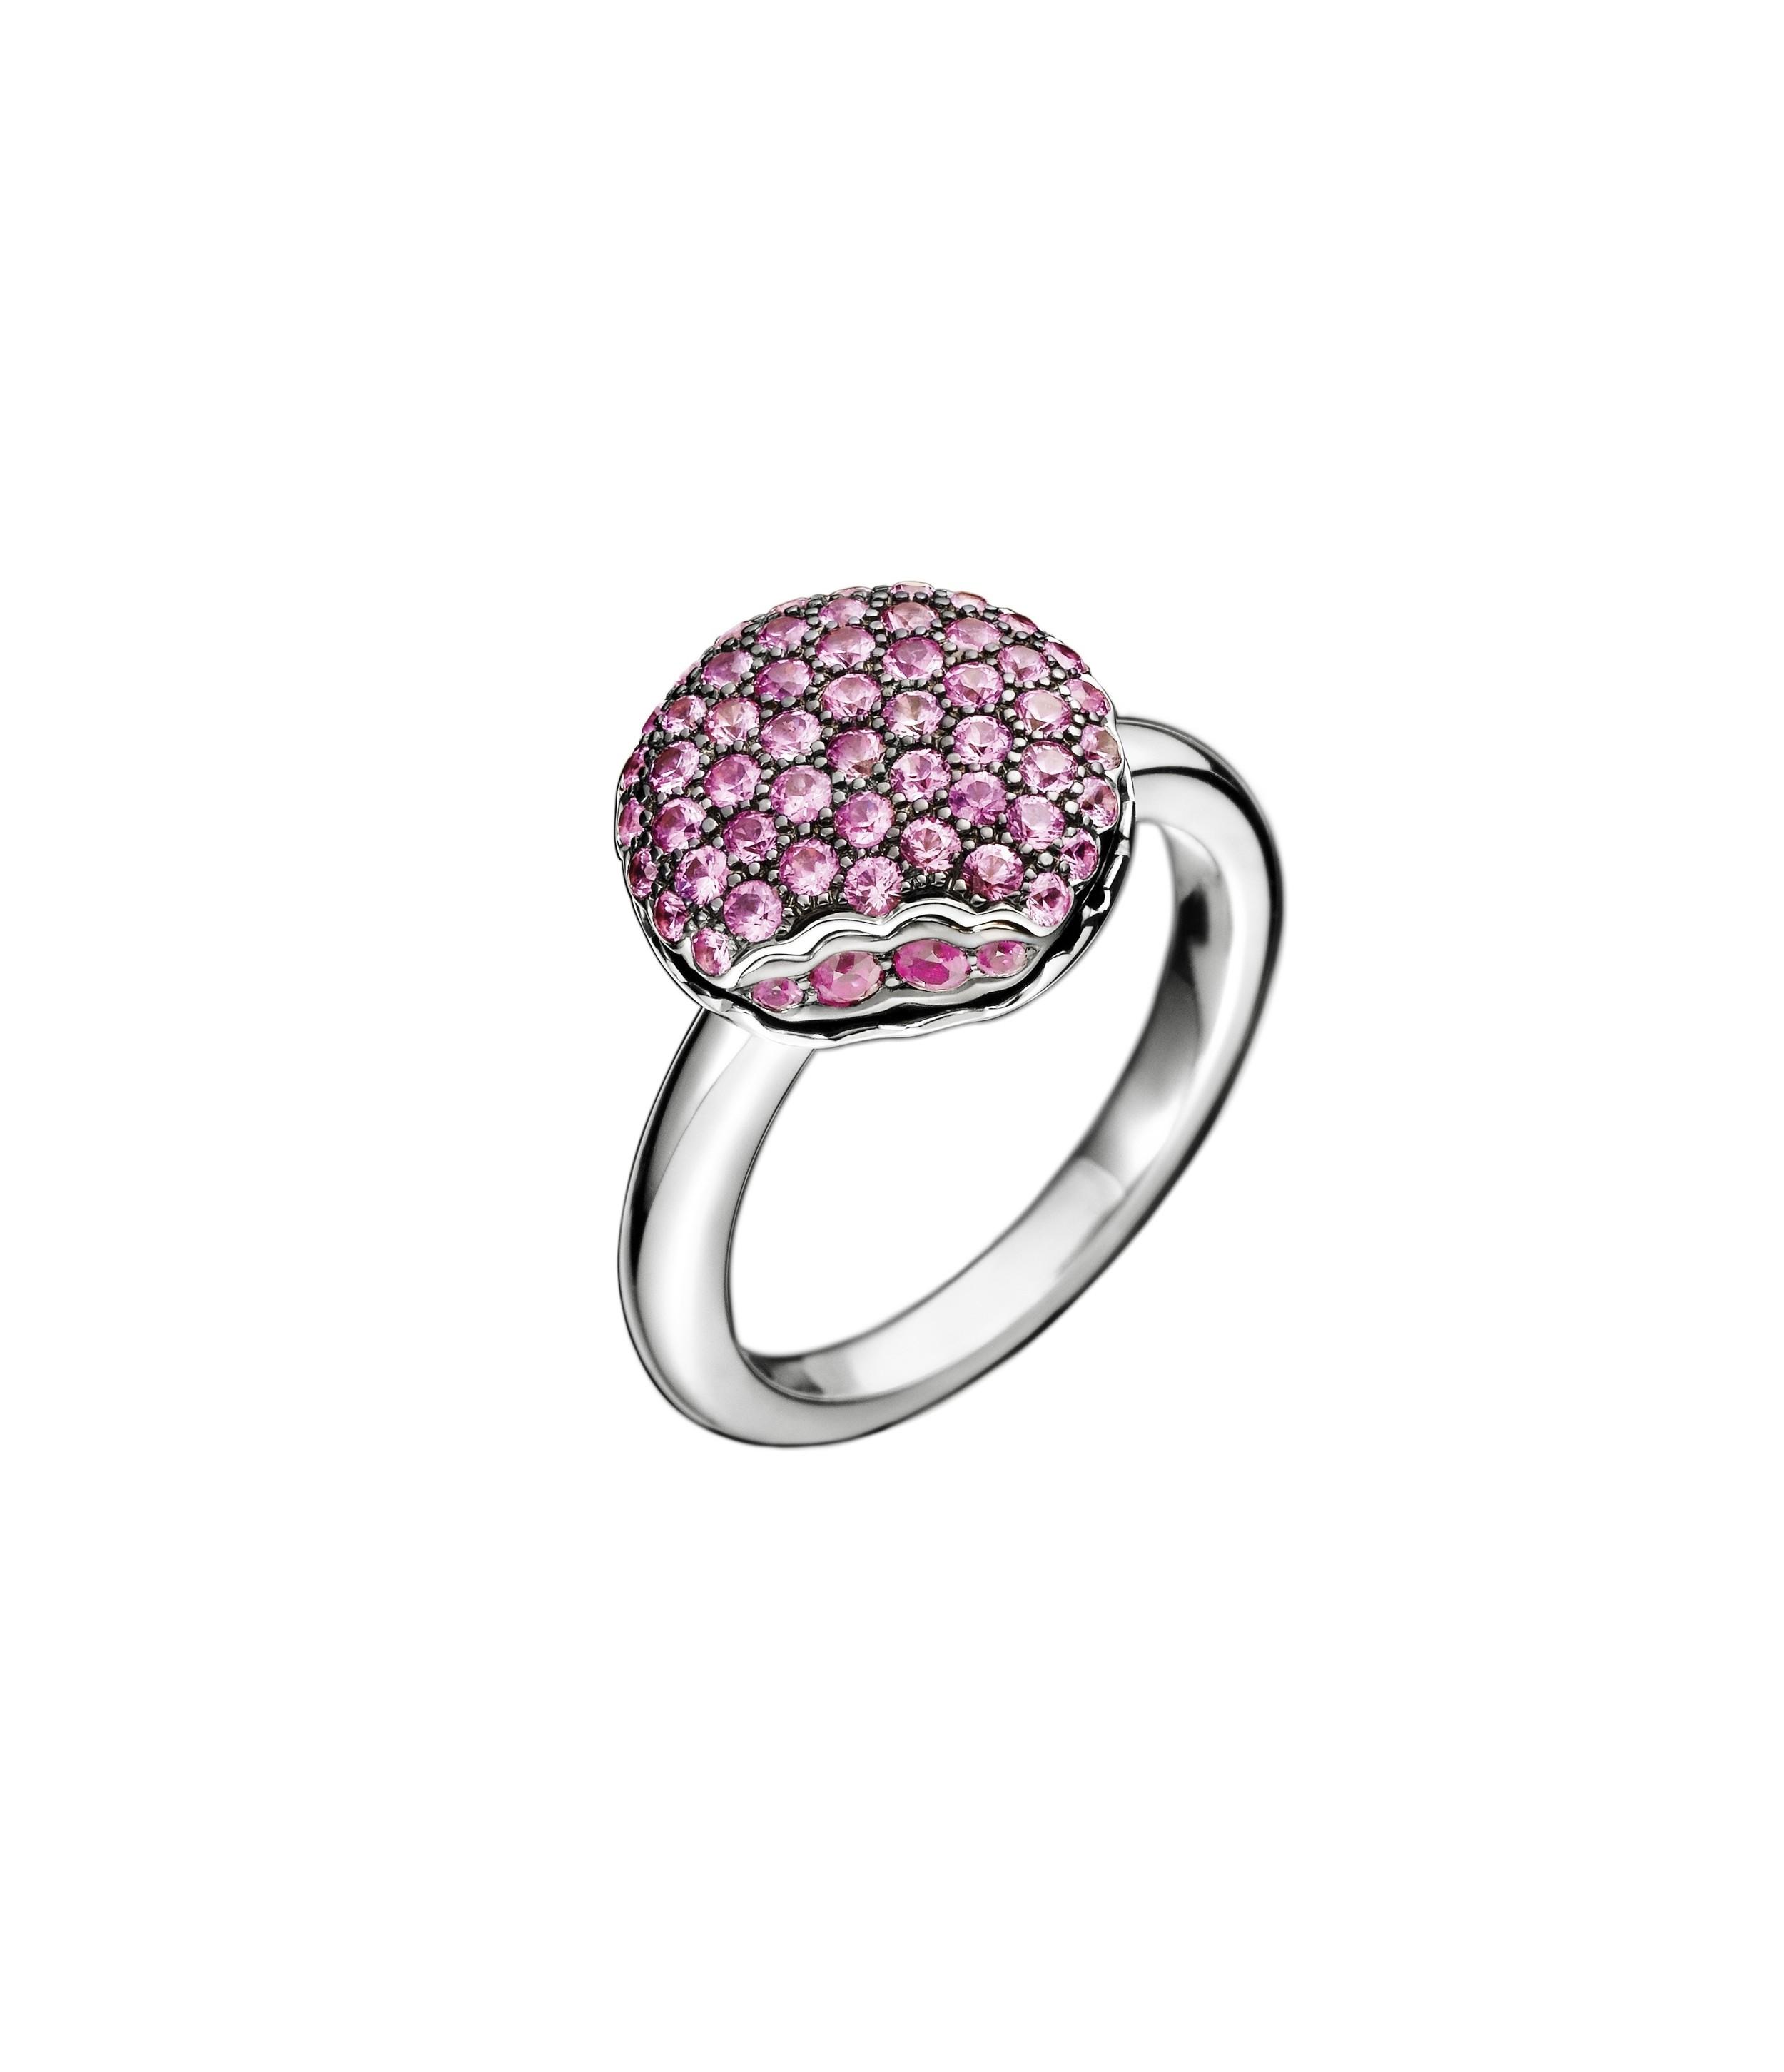 Boucheron 'Tentation Macaron' mini ring in pink sapphires and rubies. $4,850